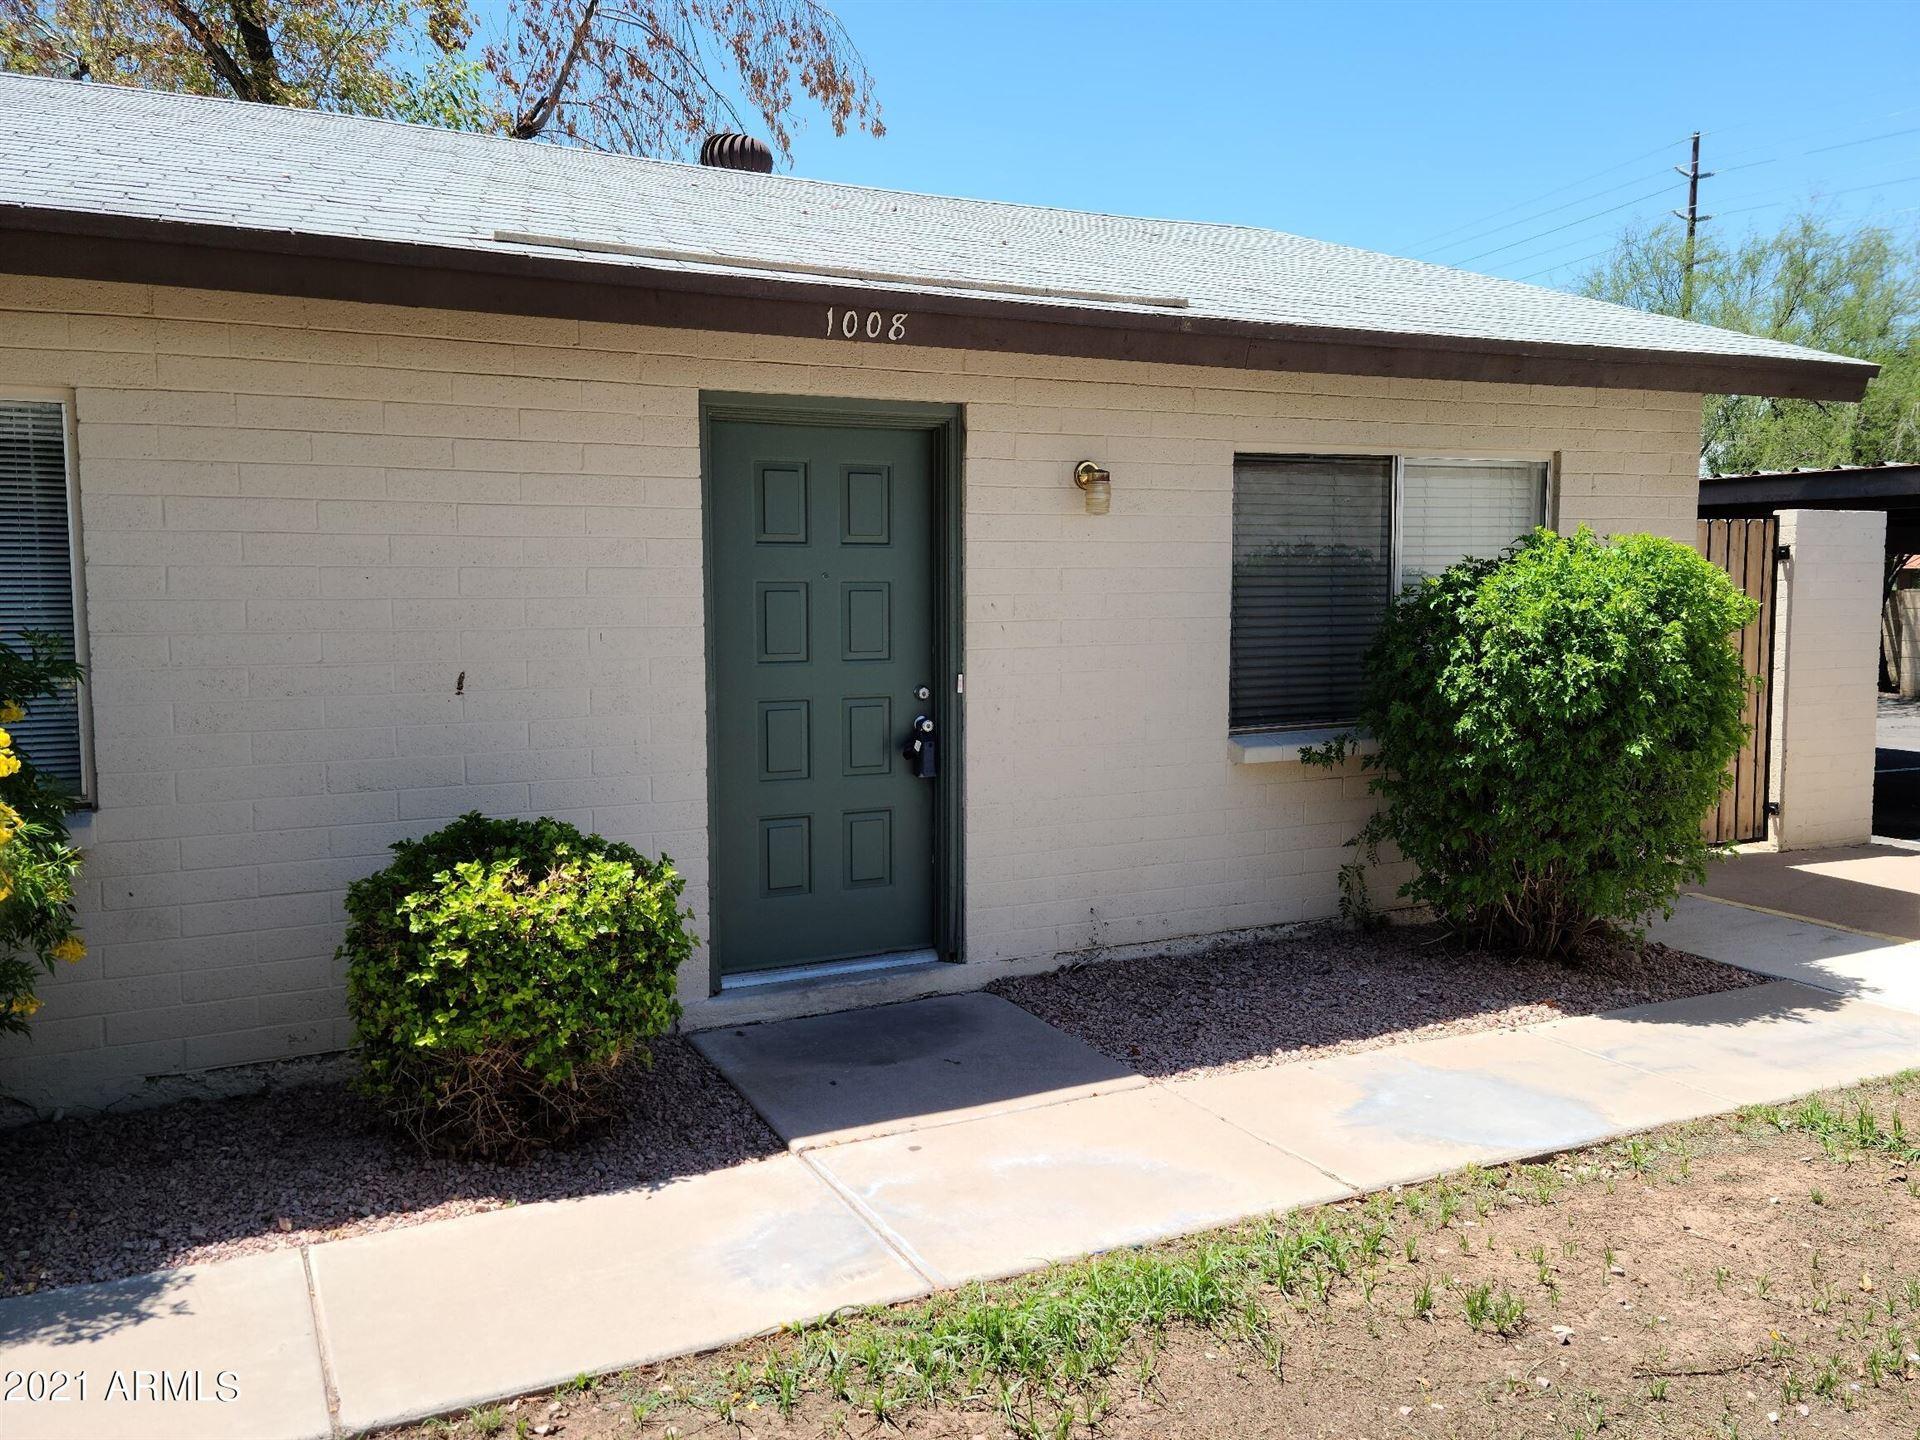 Photo of 1008 W MALIBU Drive, Tempe, AZ 85282 (MLS # 6272283)